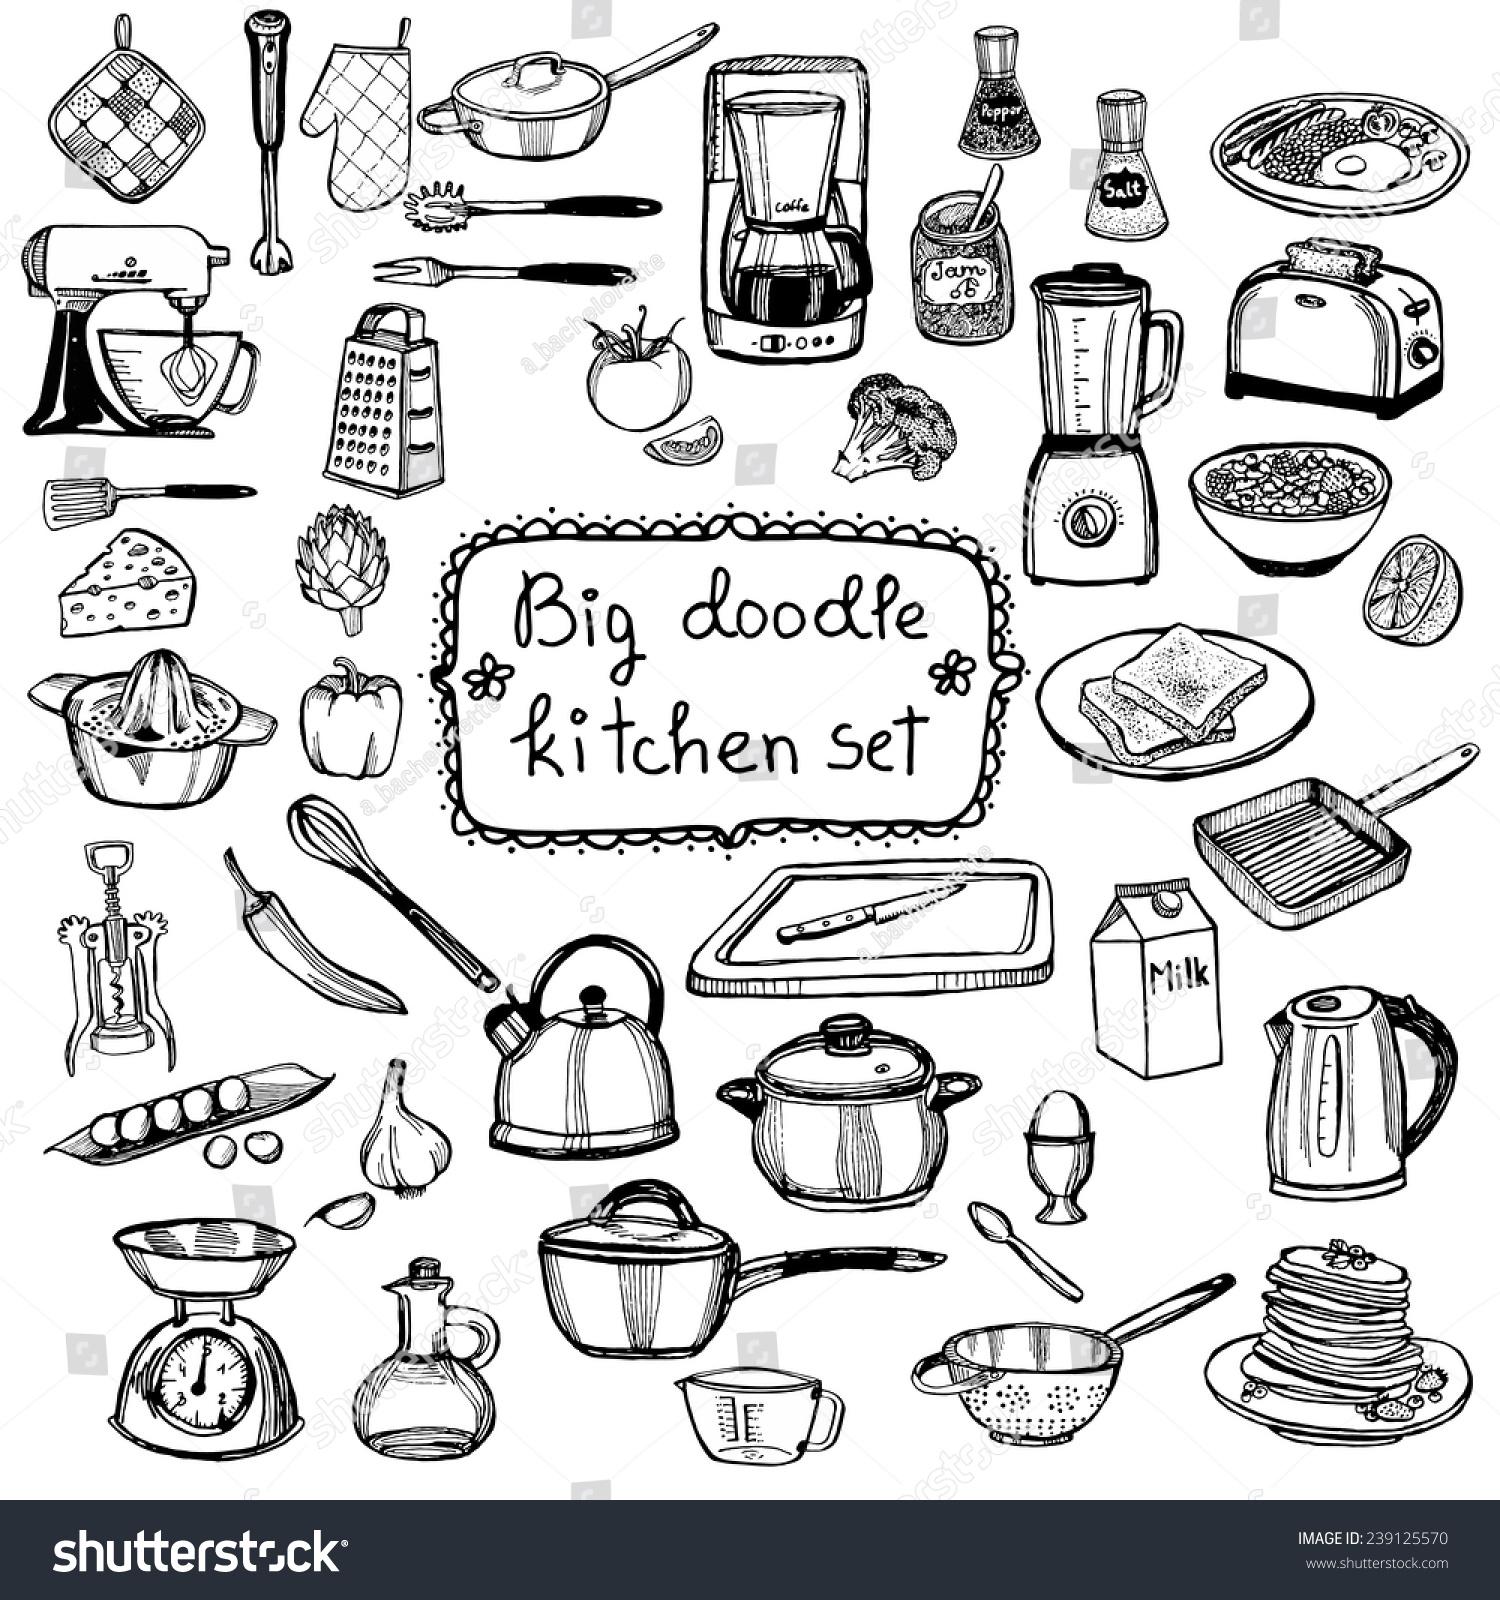 Hand drawn doodle kitchen set stock vector illustration for Kitchen set vector